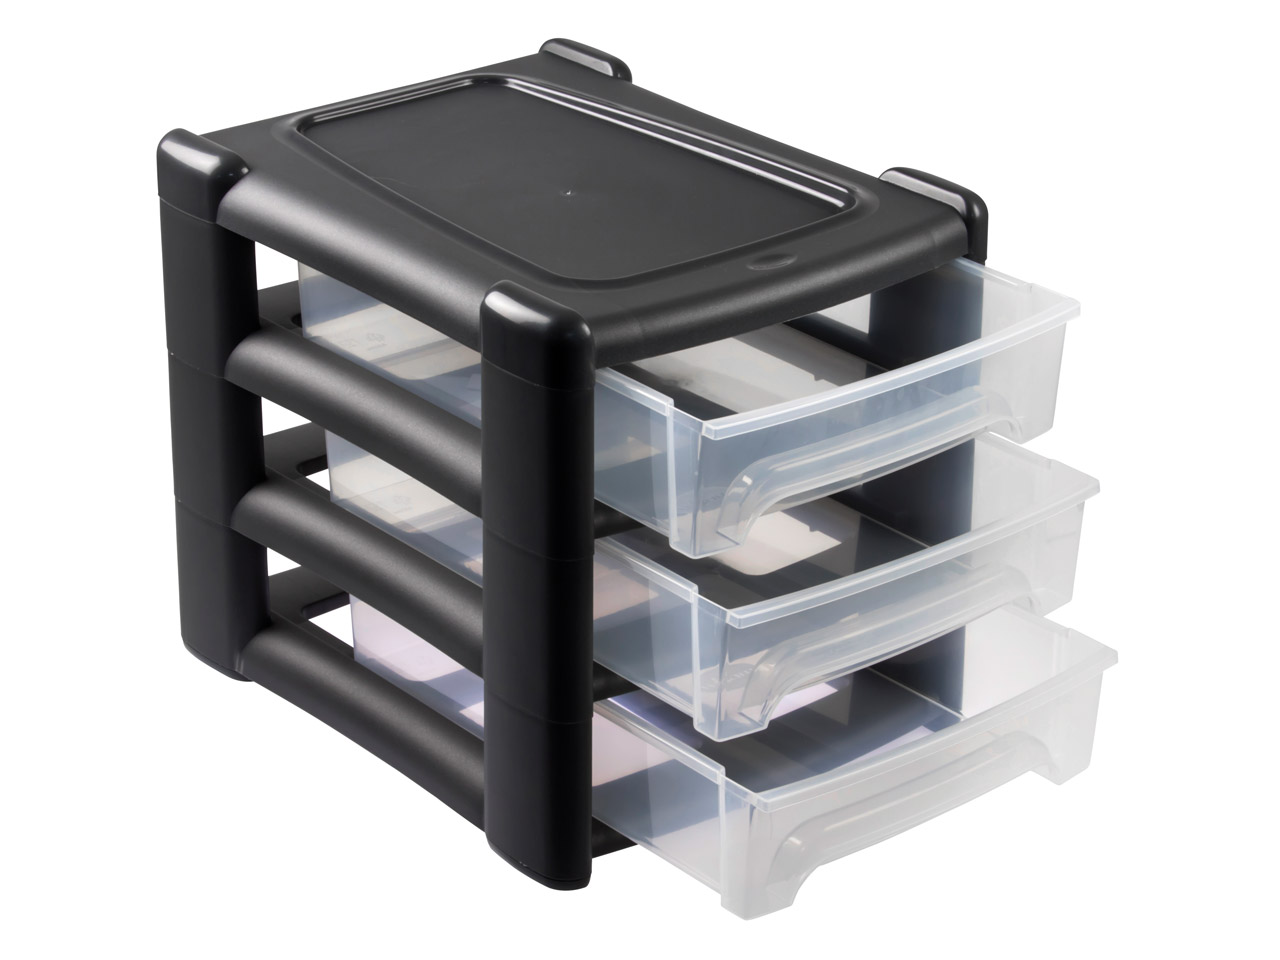 Wham Medium Storage Drawer Tower Black 3 Shallow Drawers